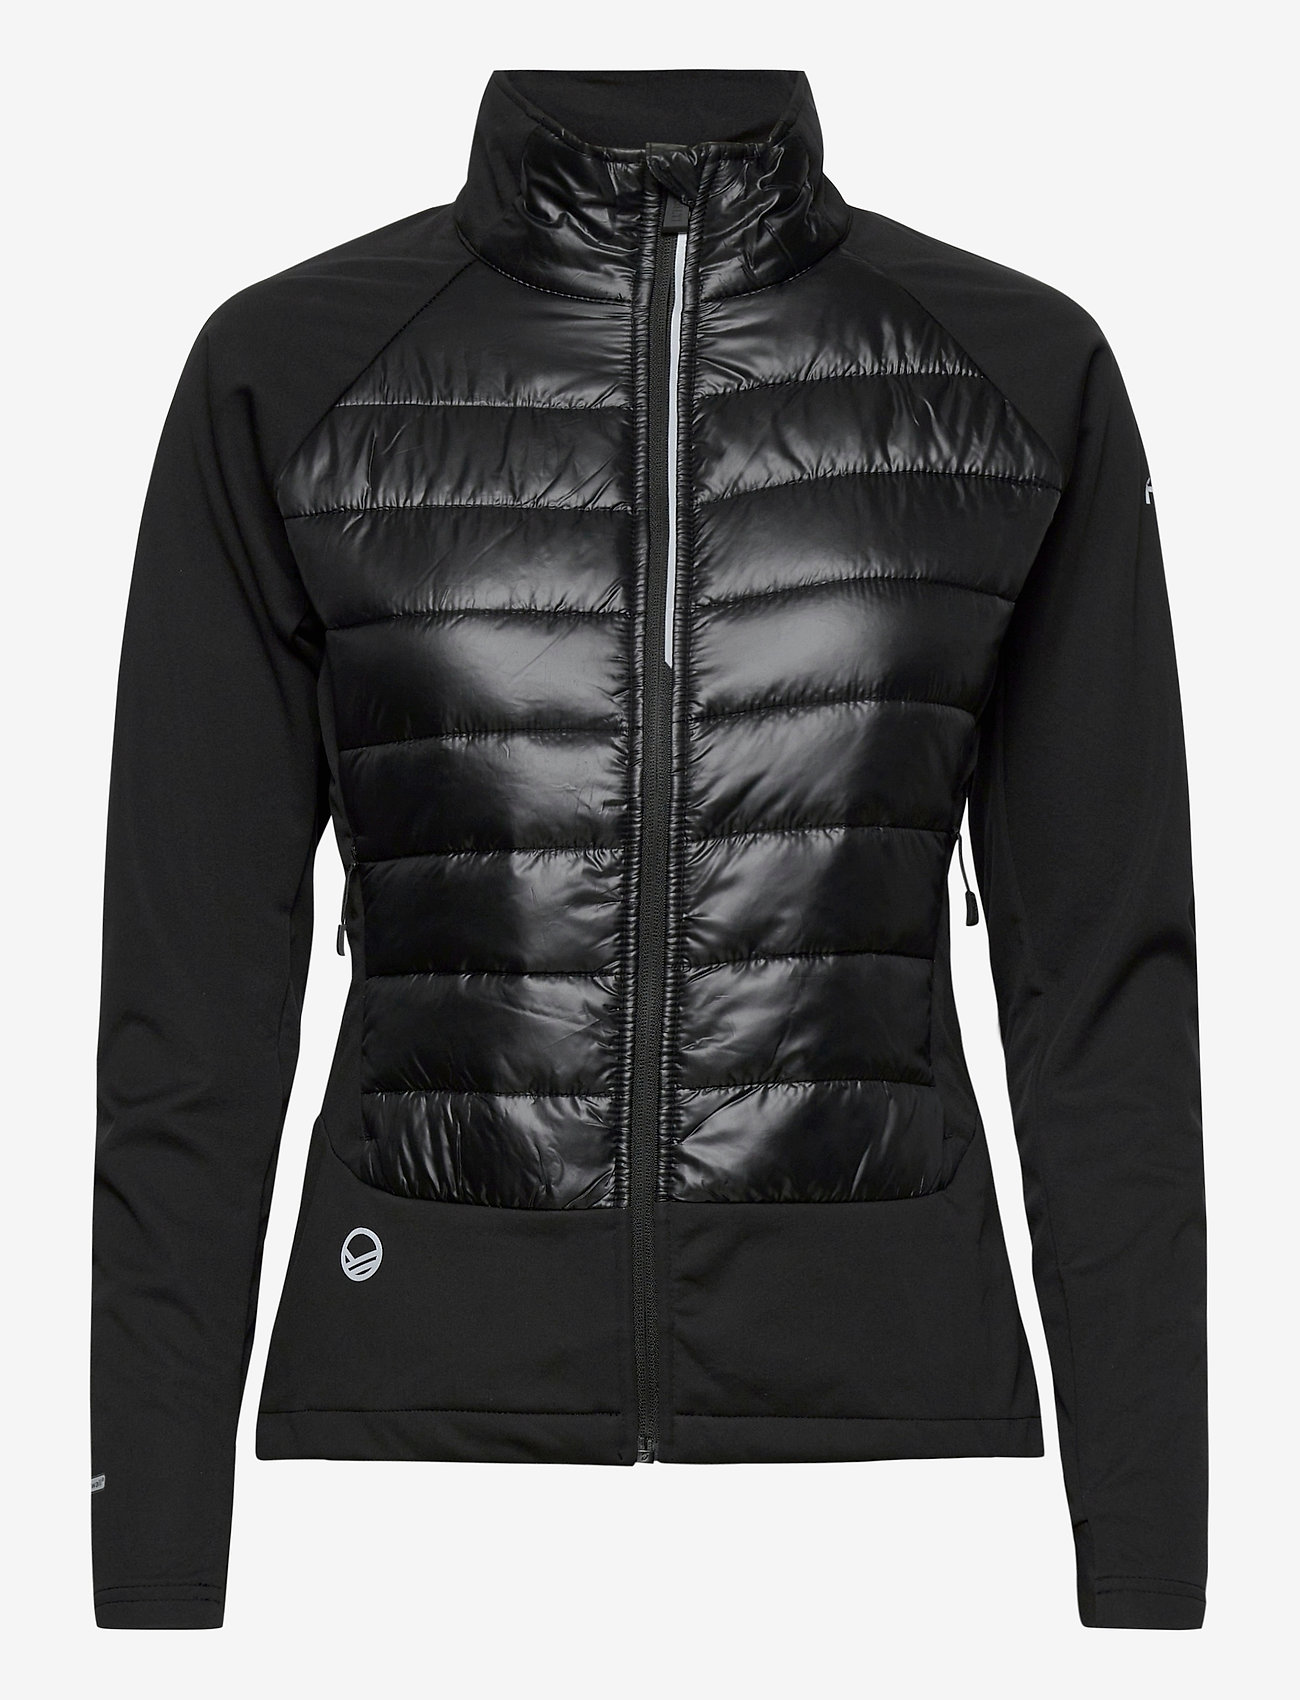 Halti - Olos Women's Hybrid Cross Country Ski Jacket - vestes d'entraînement - black - 1